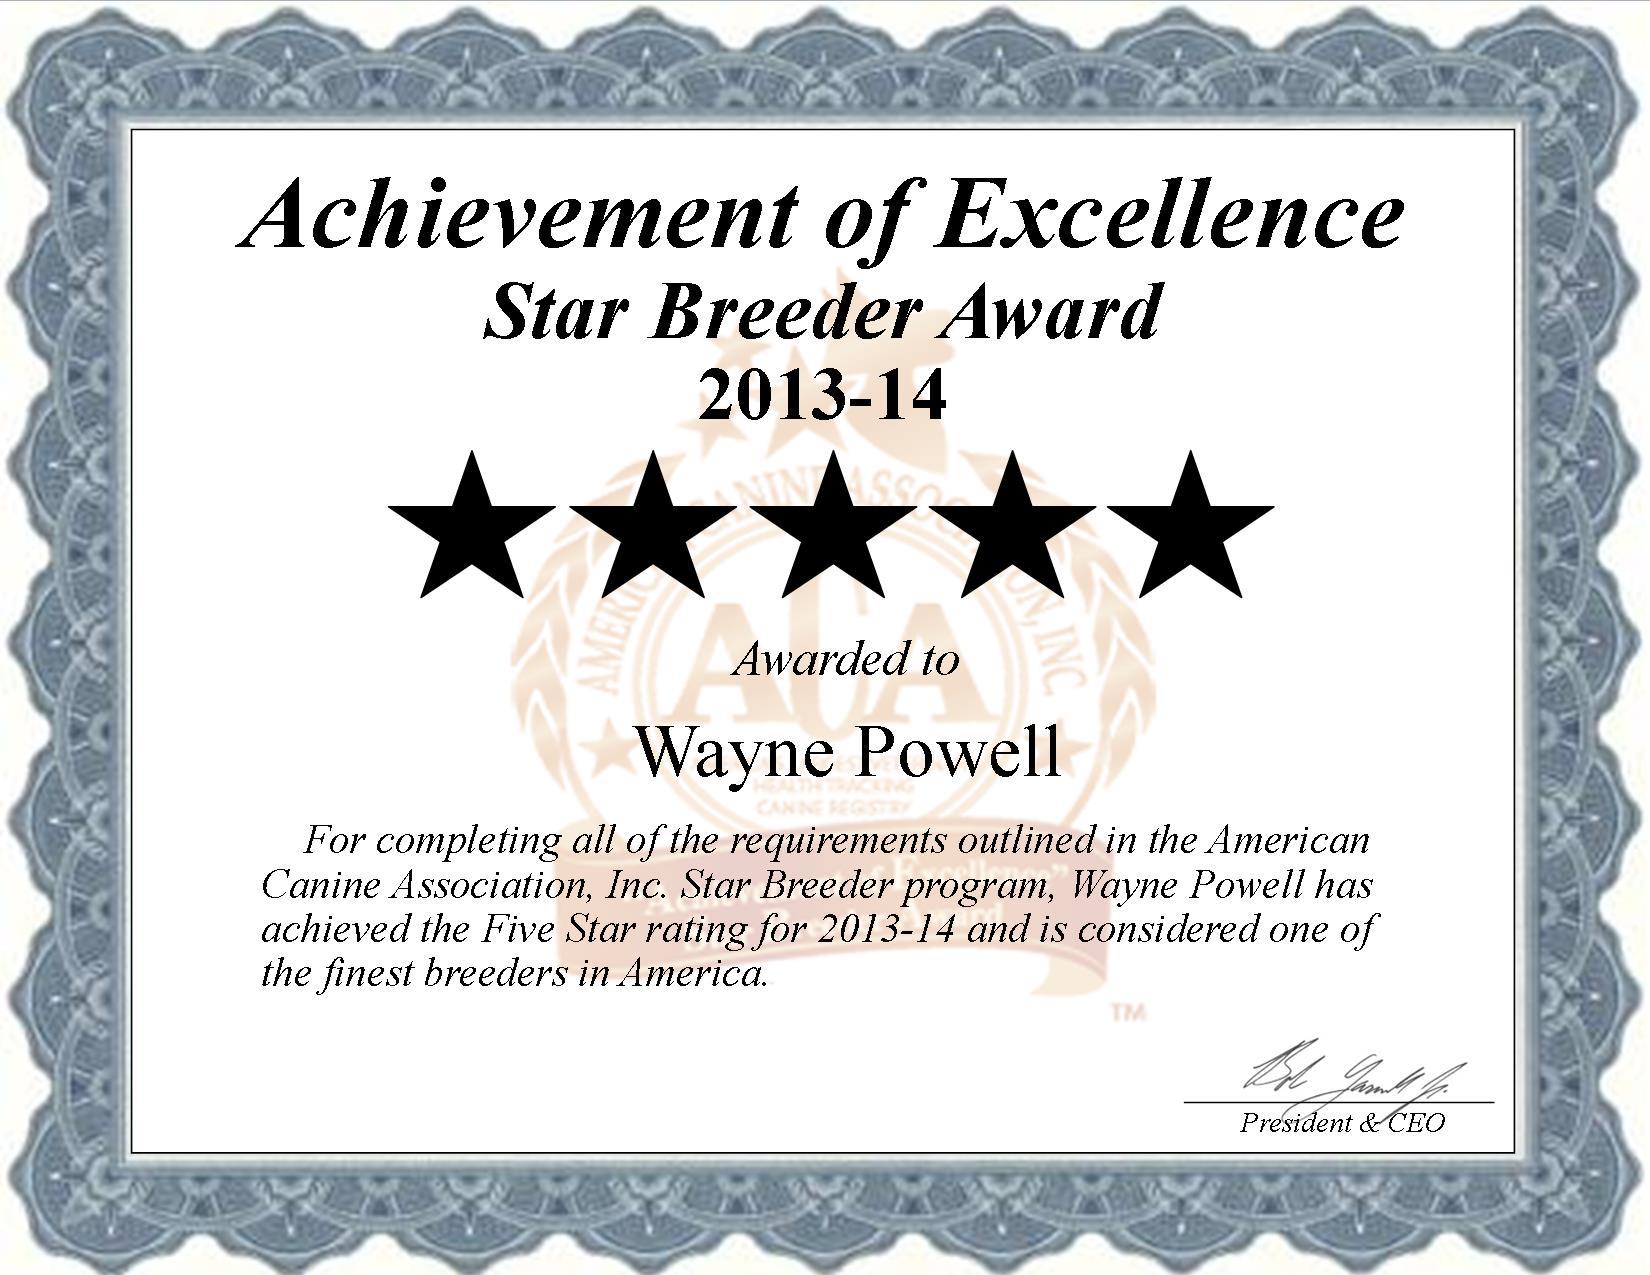 Wayne, Powell, Wayne Powell, Powell Kennel, breeder, star breeder, aca, star breeder, 5 star, oxly, Missouri, MO, dog, puppy, puppies;